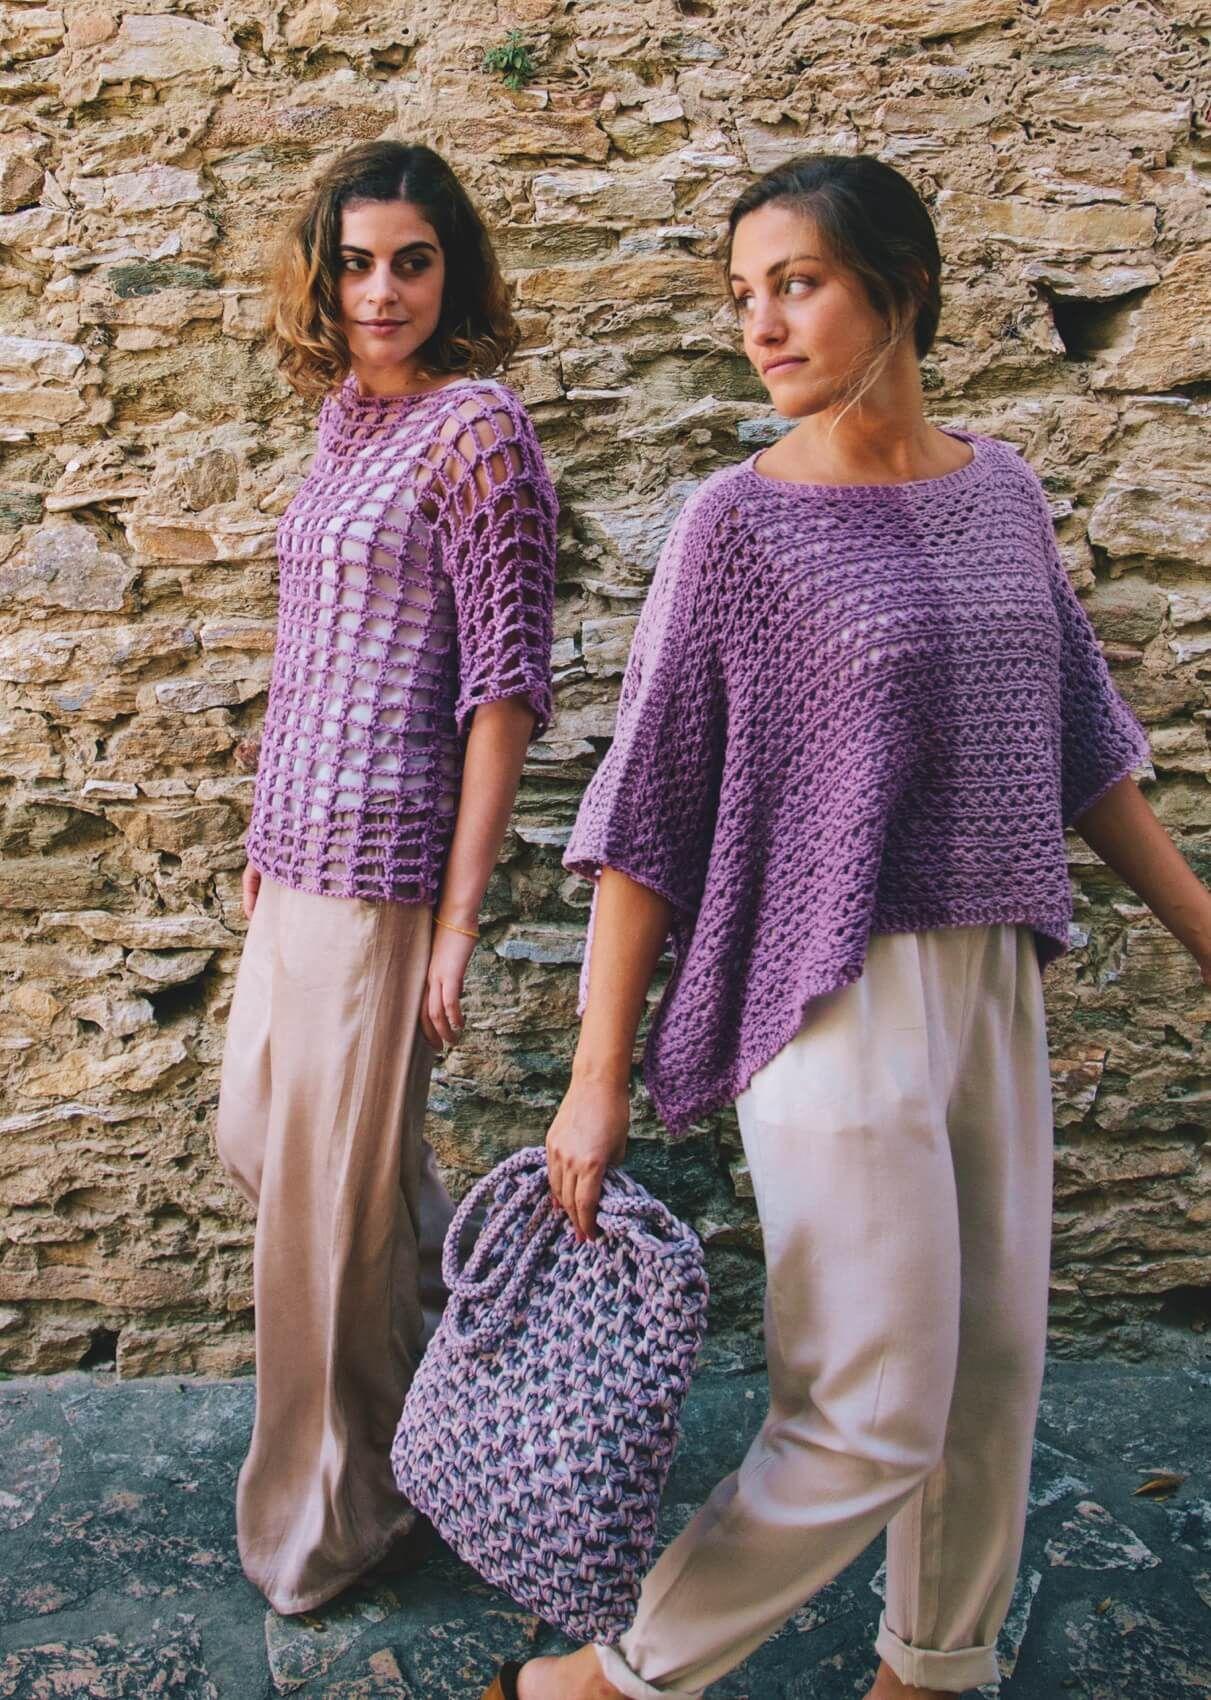 Leichter Pullover im Lochmuster | Pinterest | Lochmuster, Pullover ...